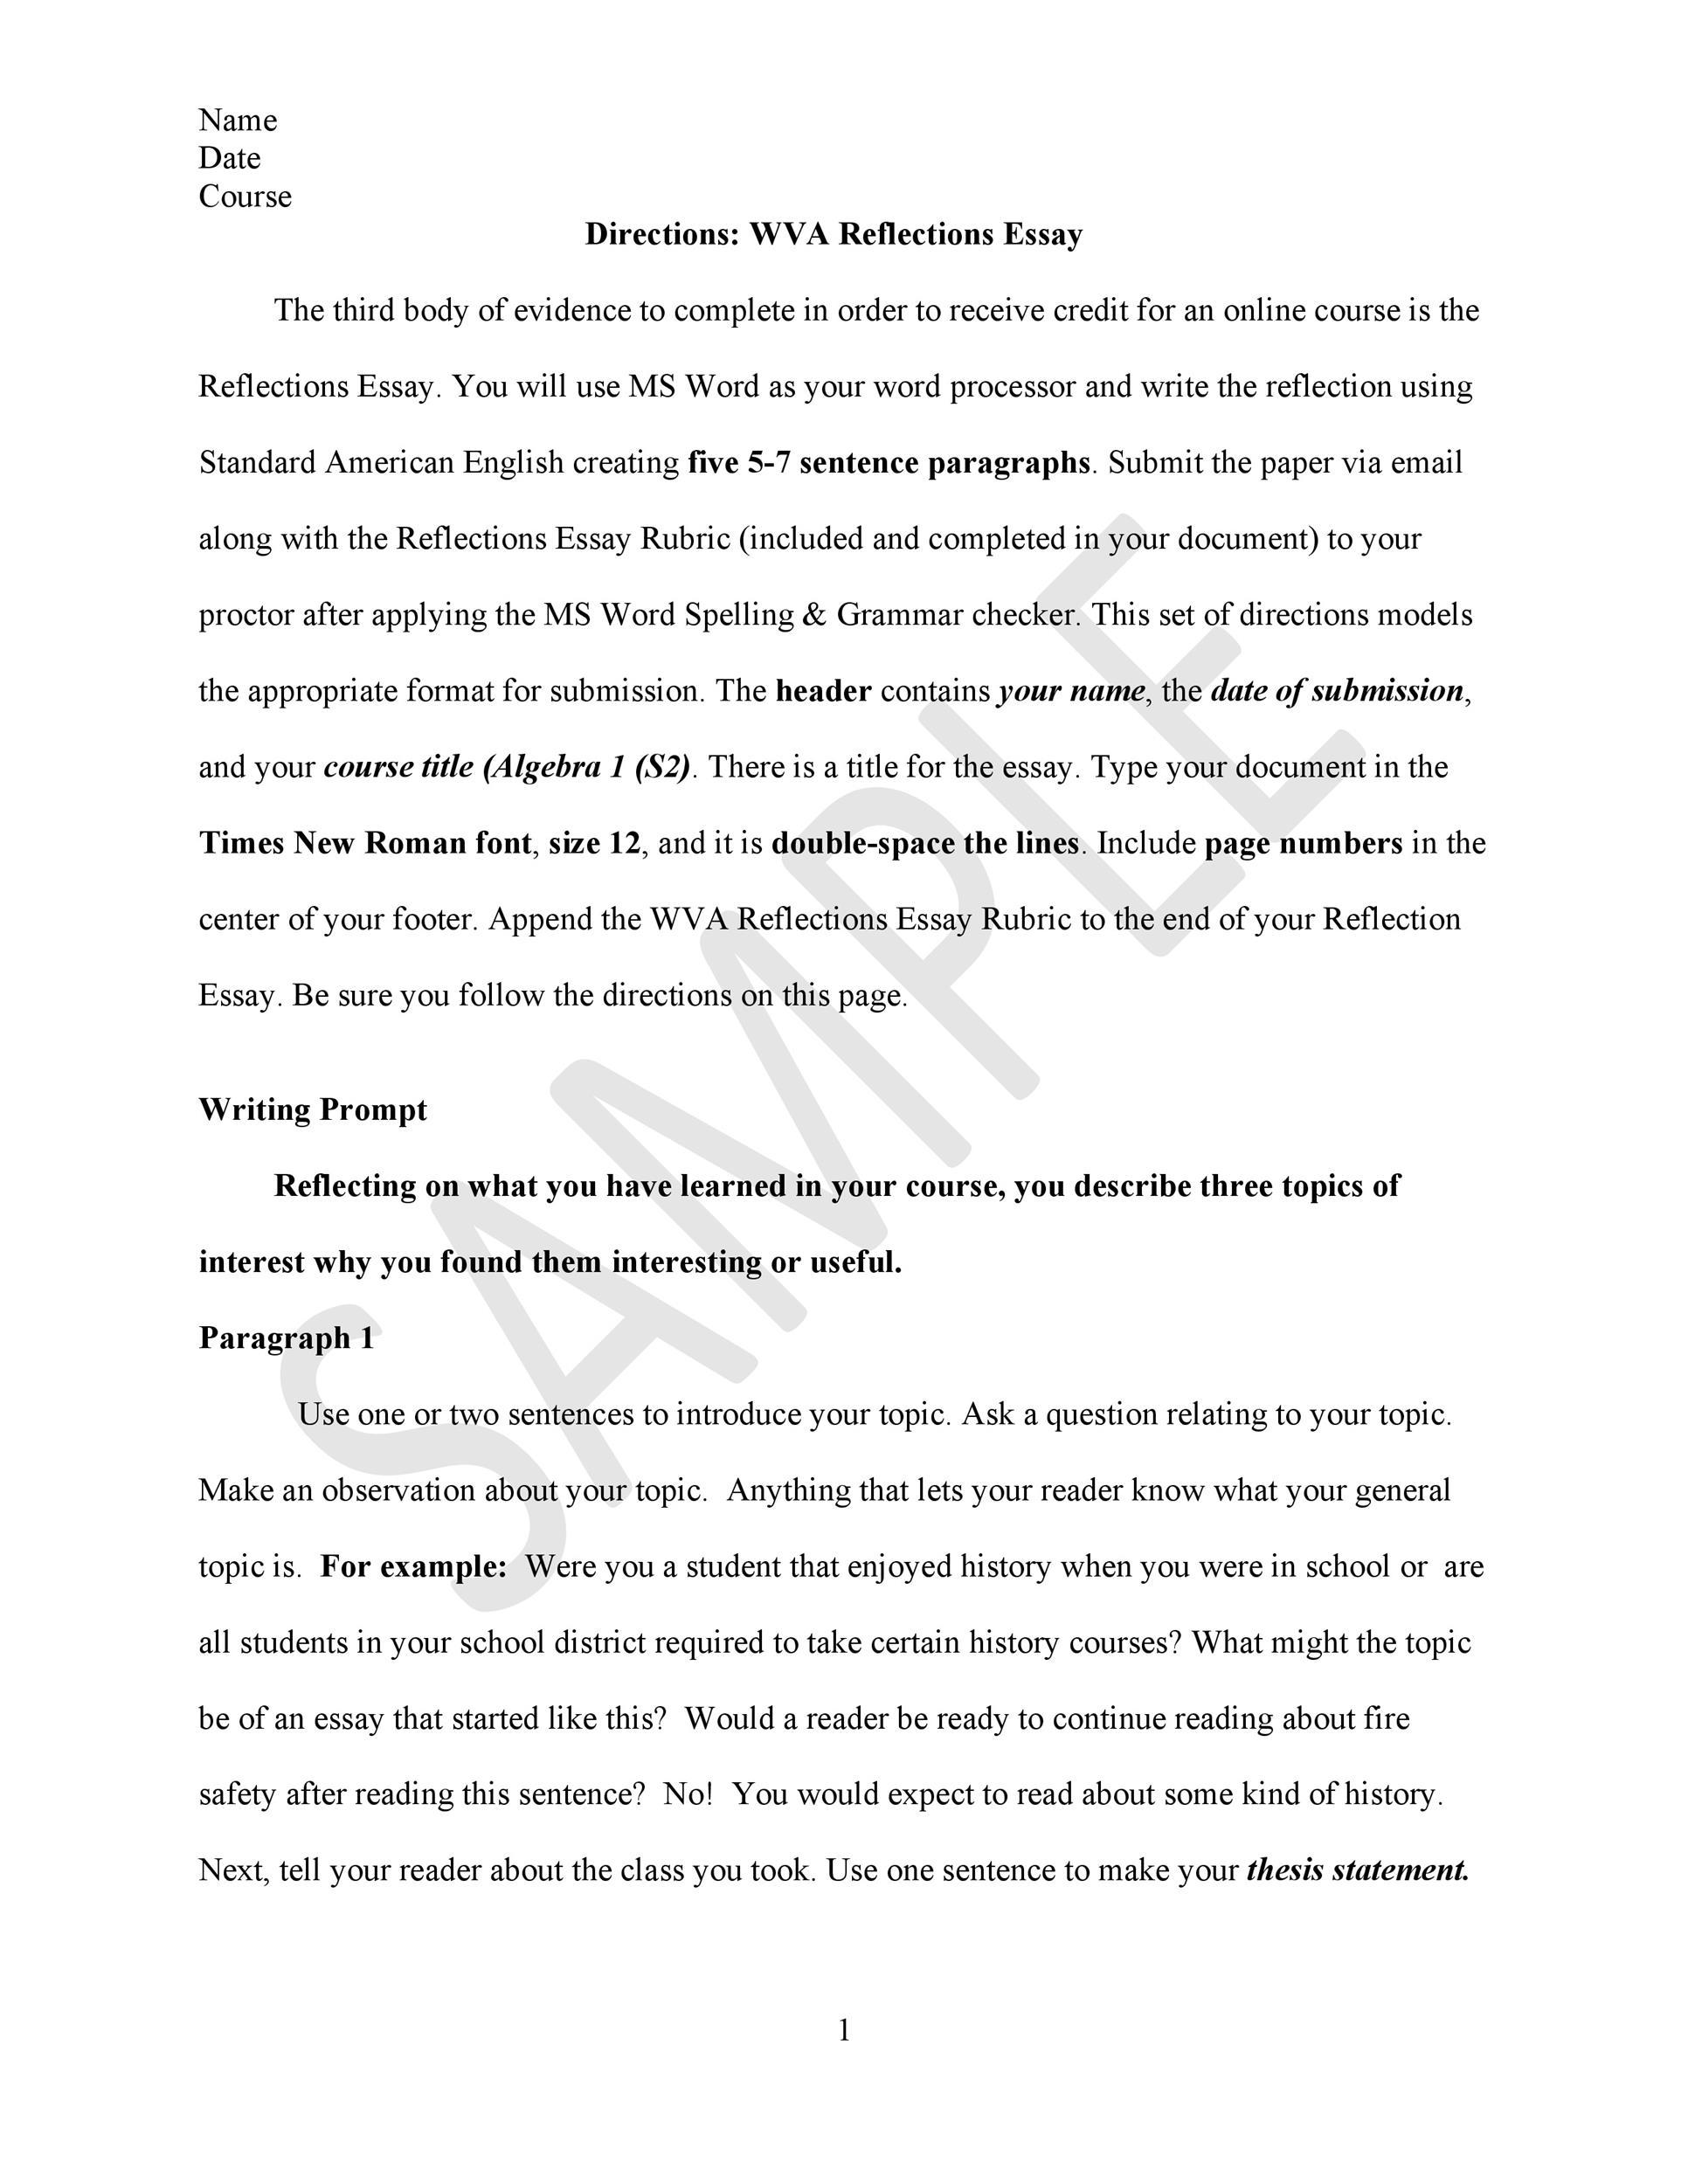 Free reflective essay example 10